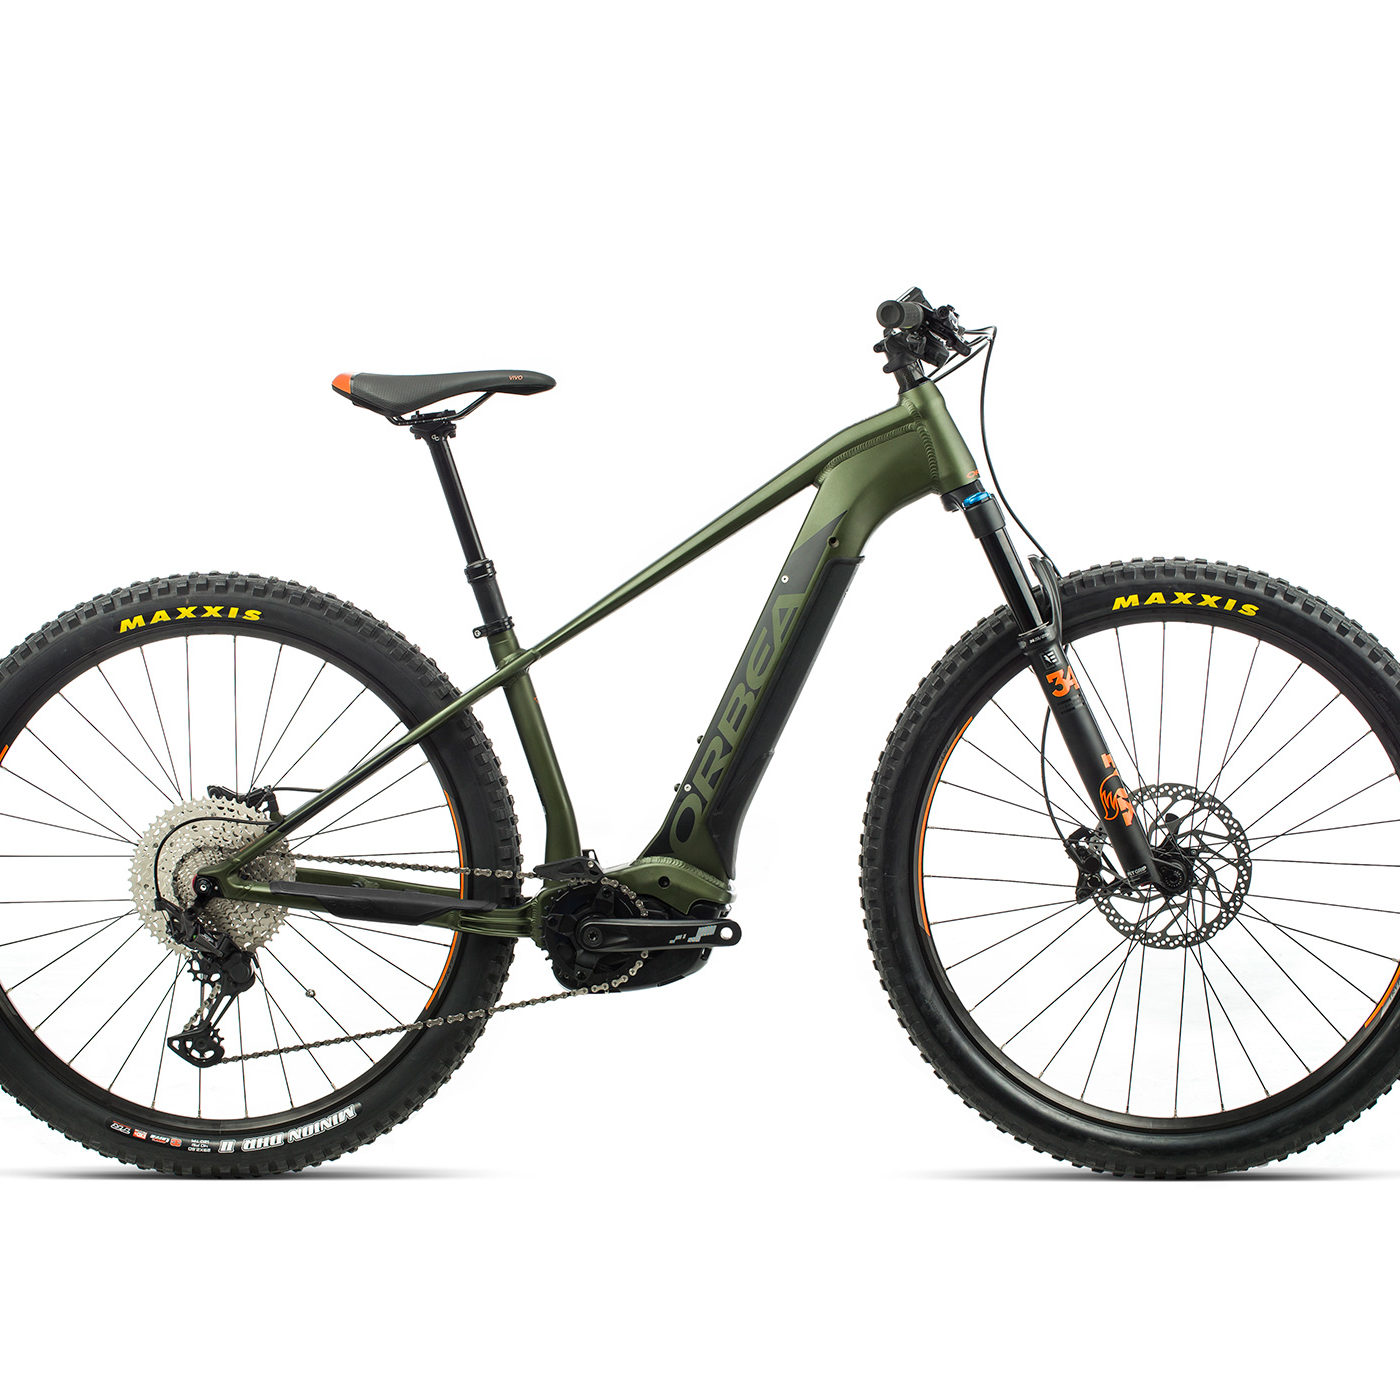 ORBEA WILD HT20 29 ebike - GROEN / ZWART (DOF) @G-Bikes